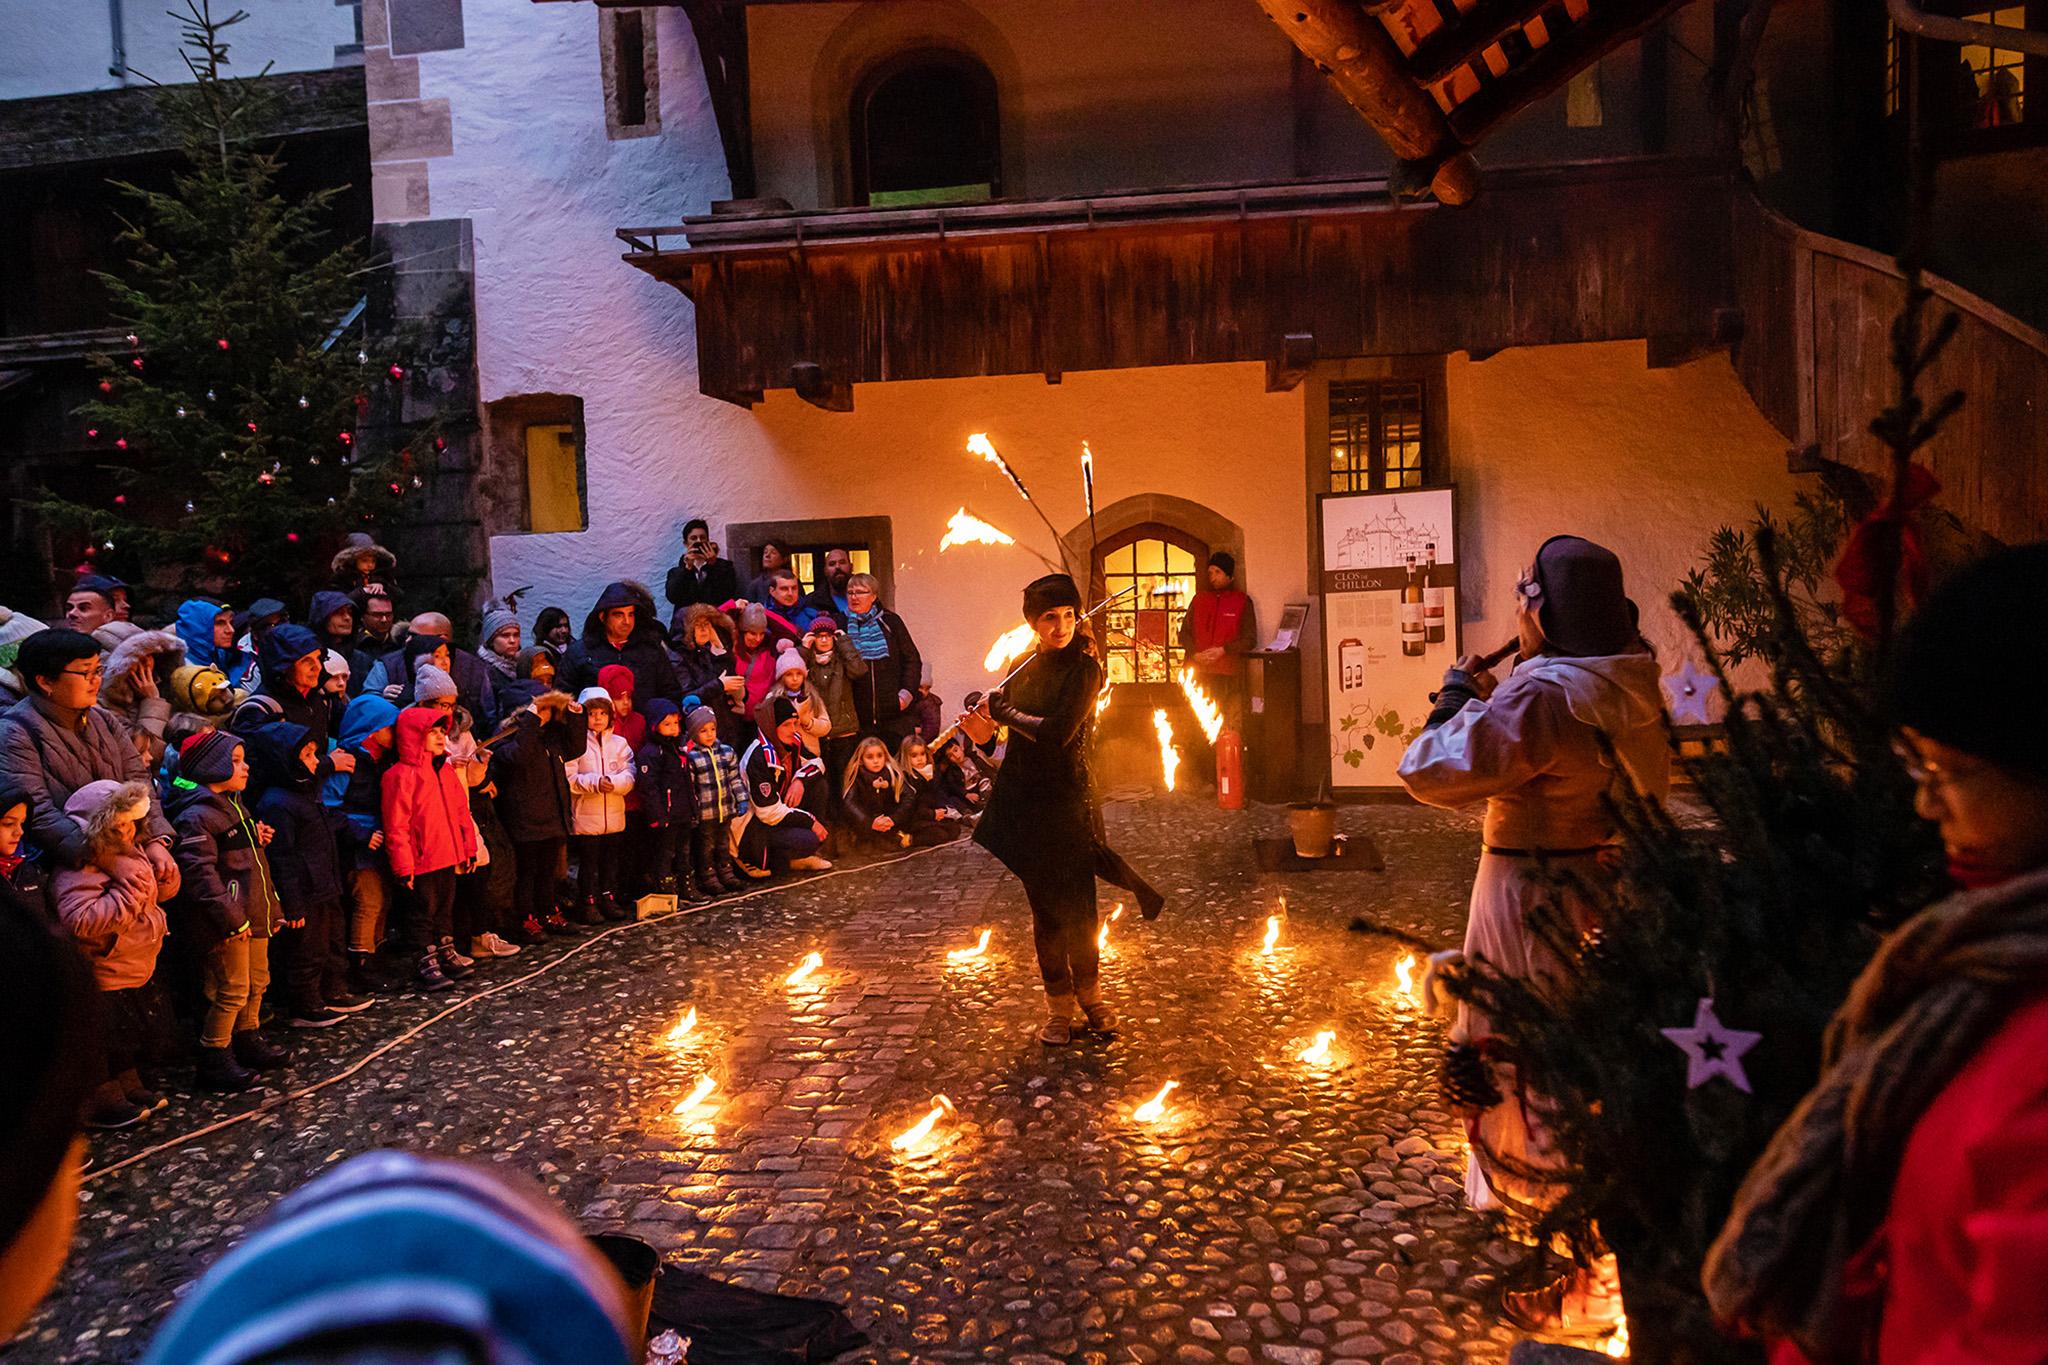 kt_2020_300_Keytours_excursions_Swisstours_chateau chillon6_2048_10